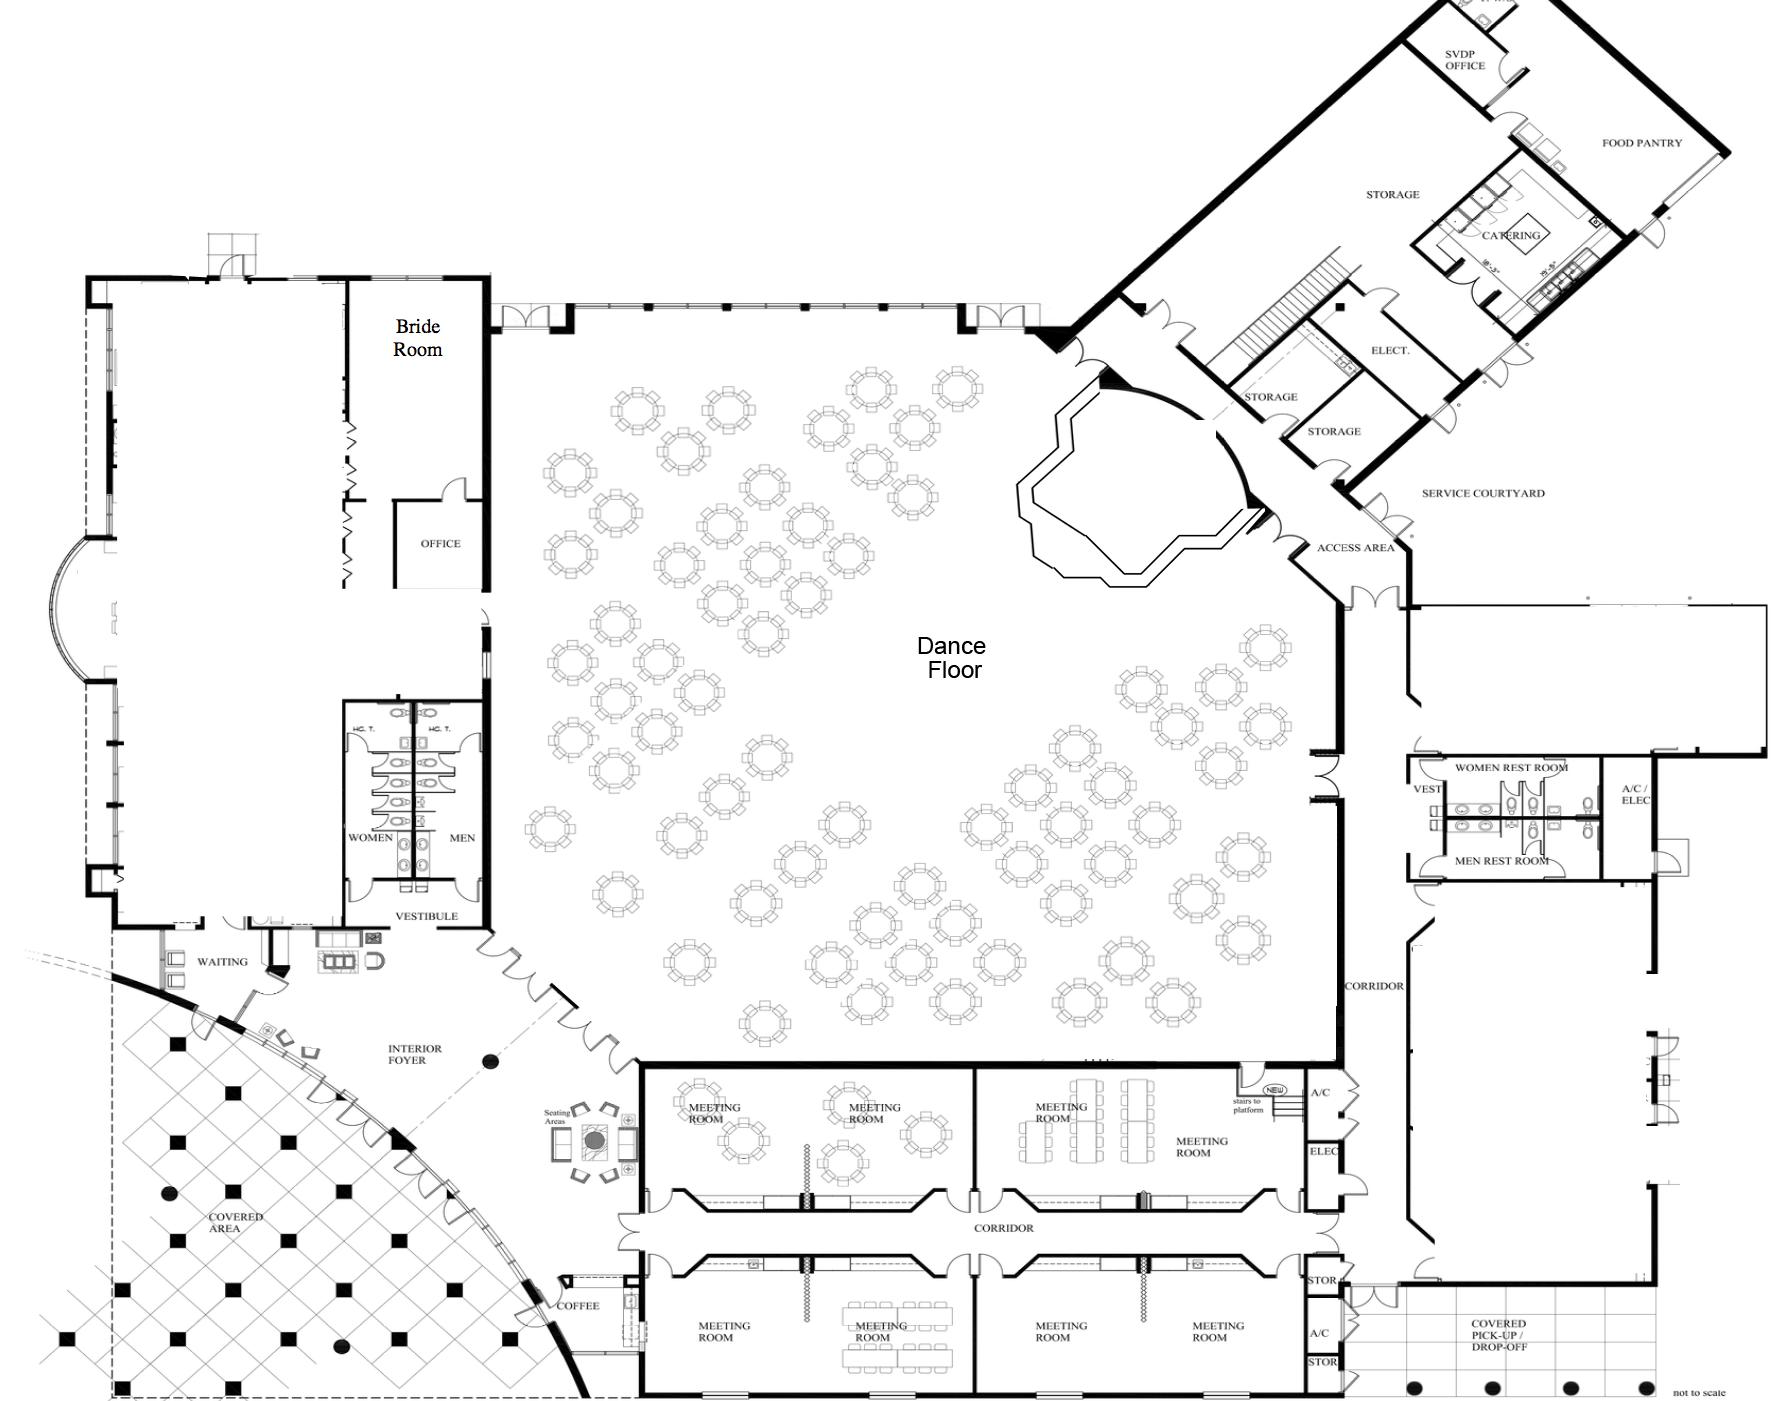 About Venetian Event Center